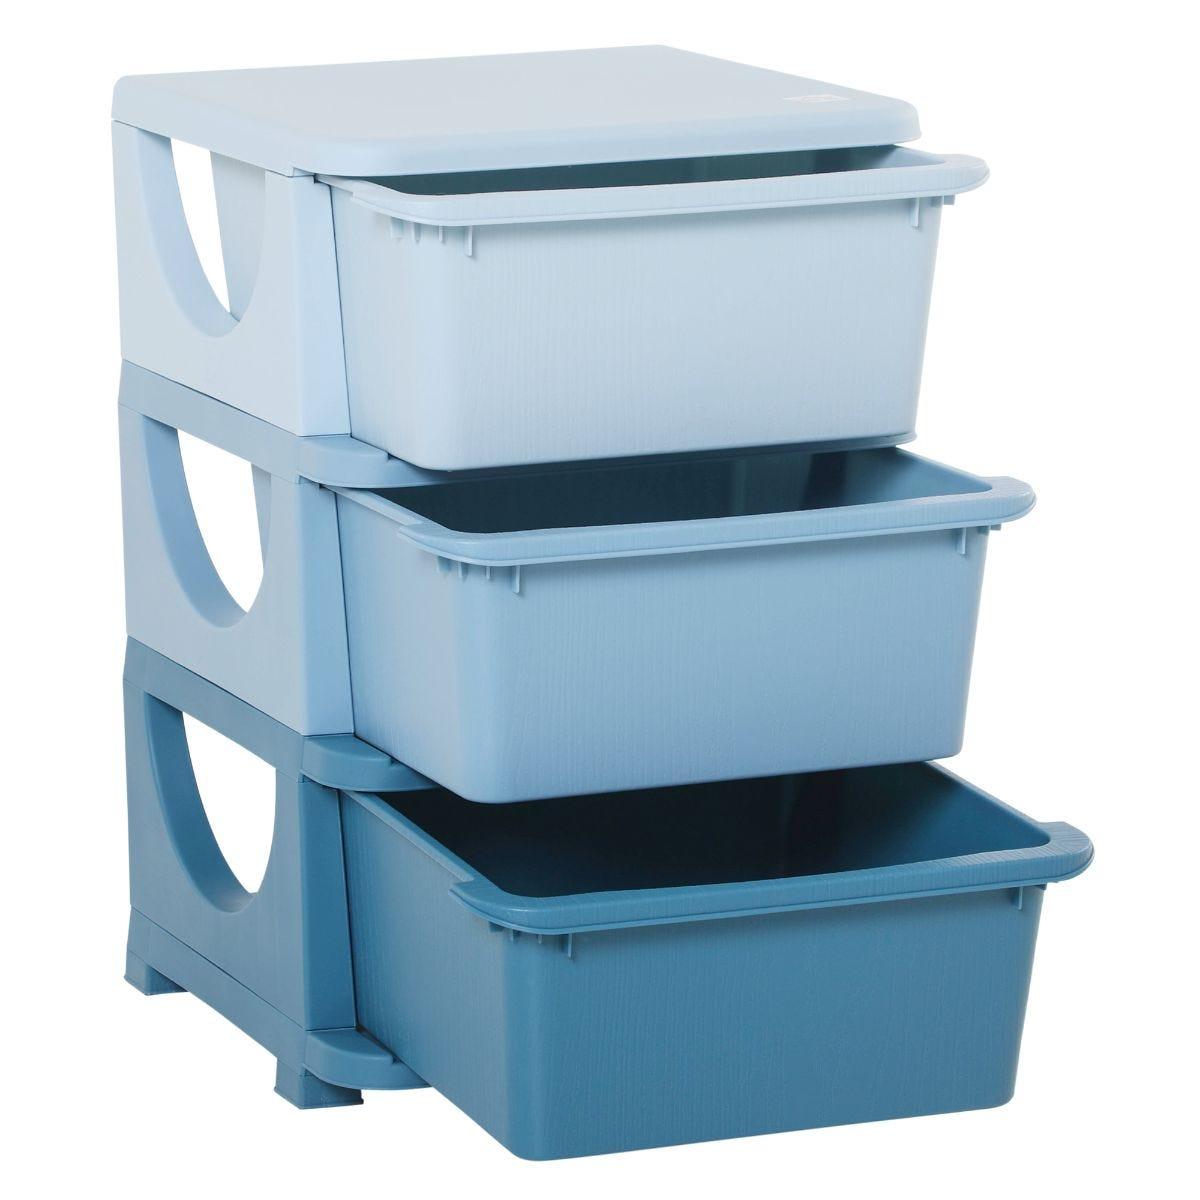 Kids Storage Unit with Drawers 3 Tier Chest Vertical Dresser Tower Blue